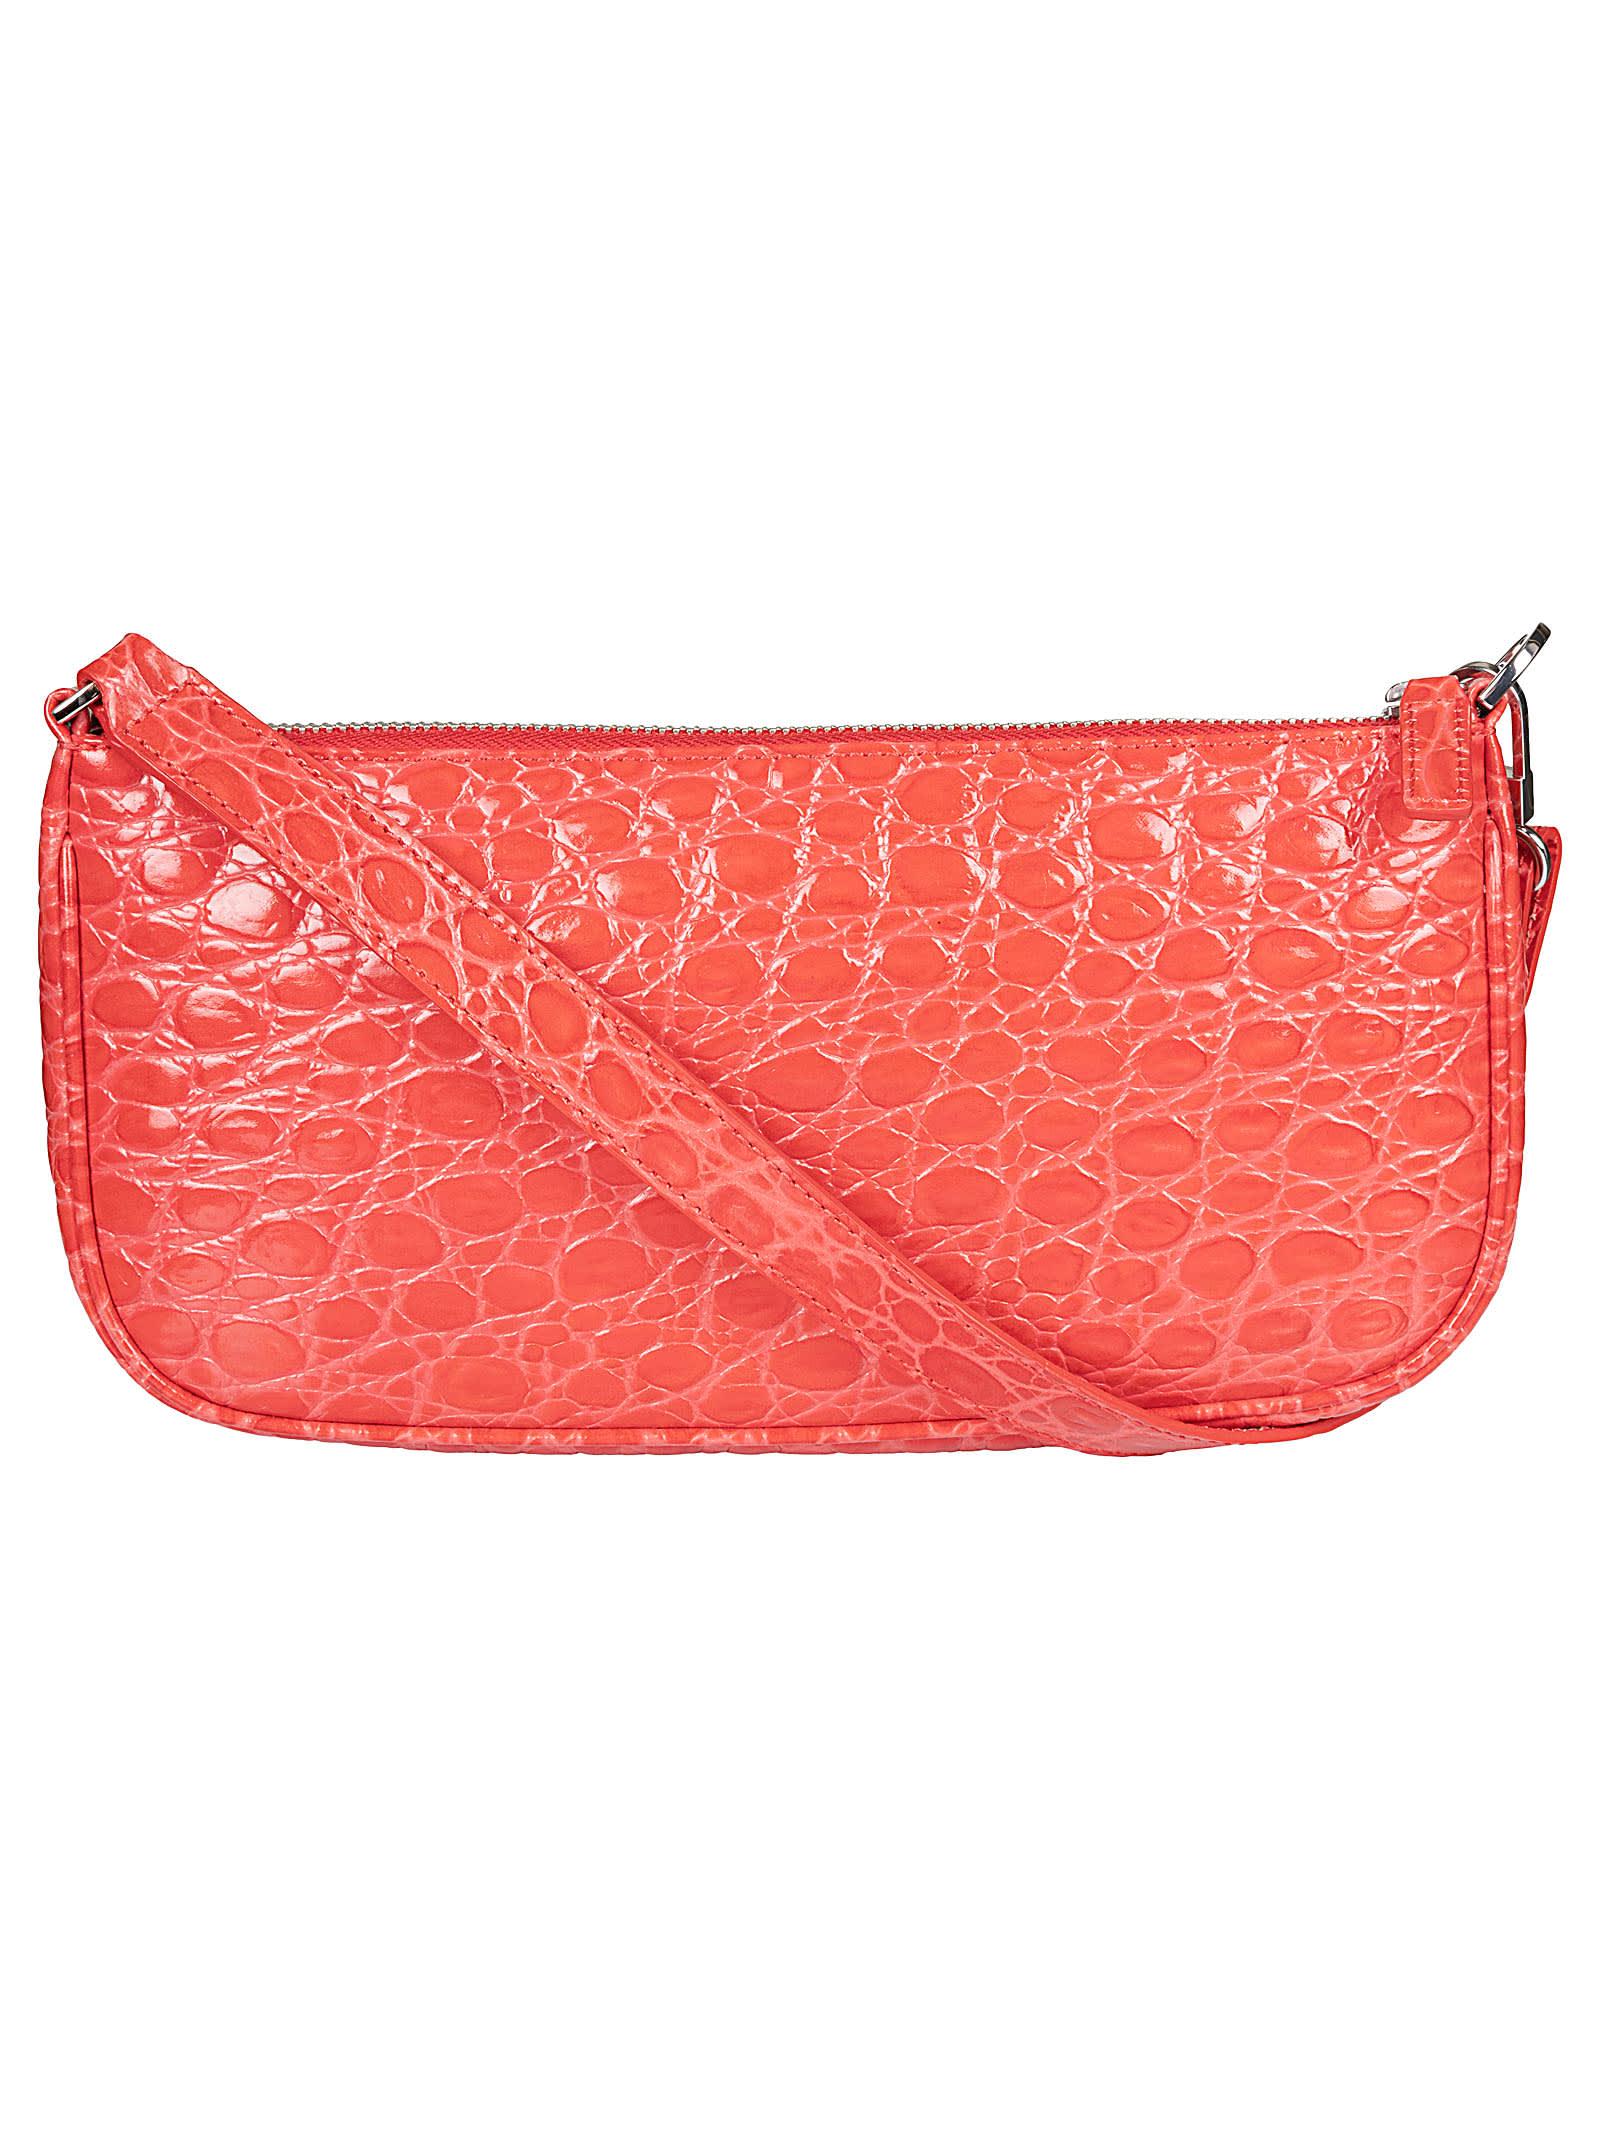 By Far Circular Croco Embossed Leather Shoulder Bag In Pomodoro